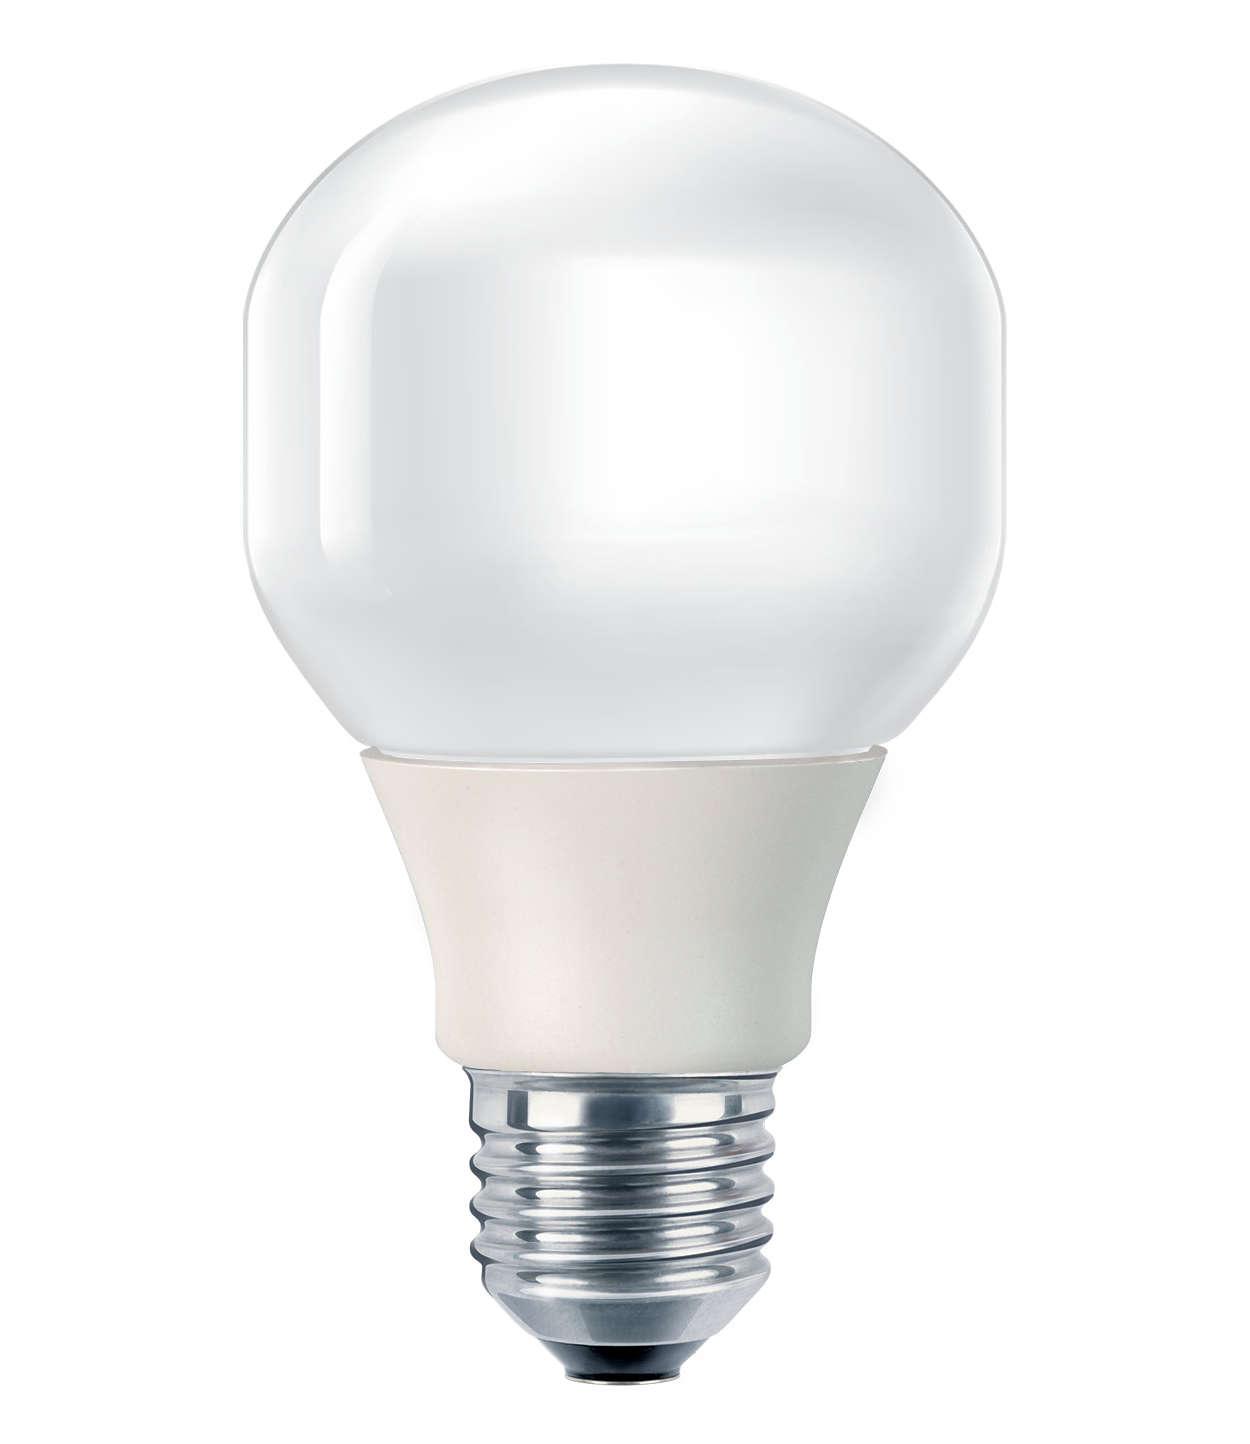 Мека и приятна светлина при икономично потребление на енергия